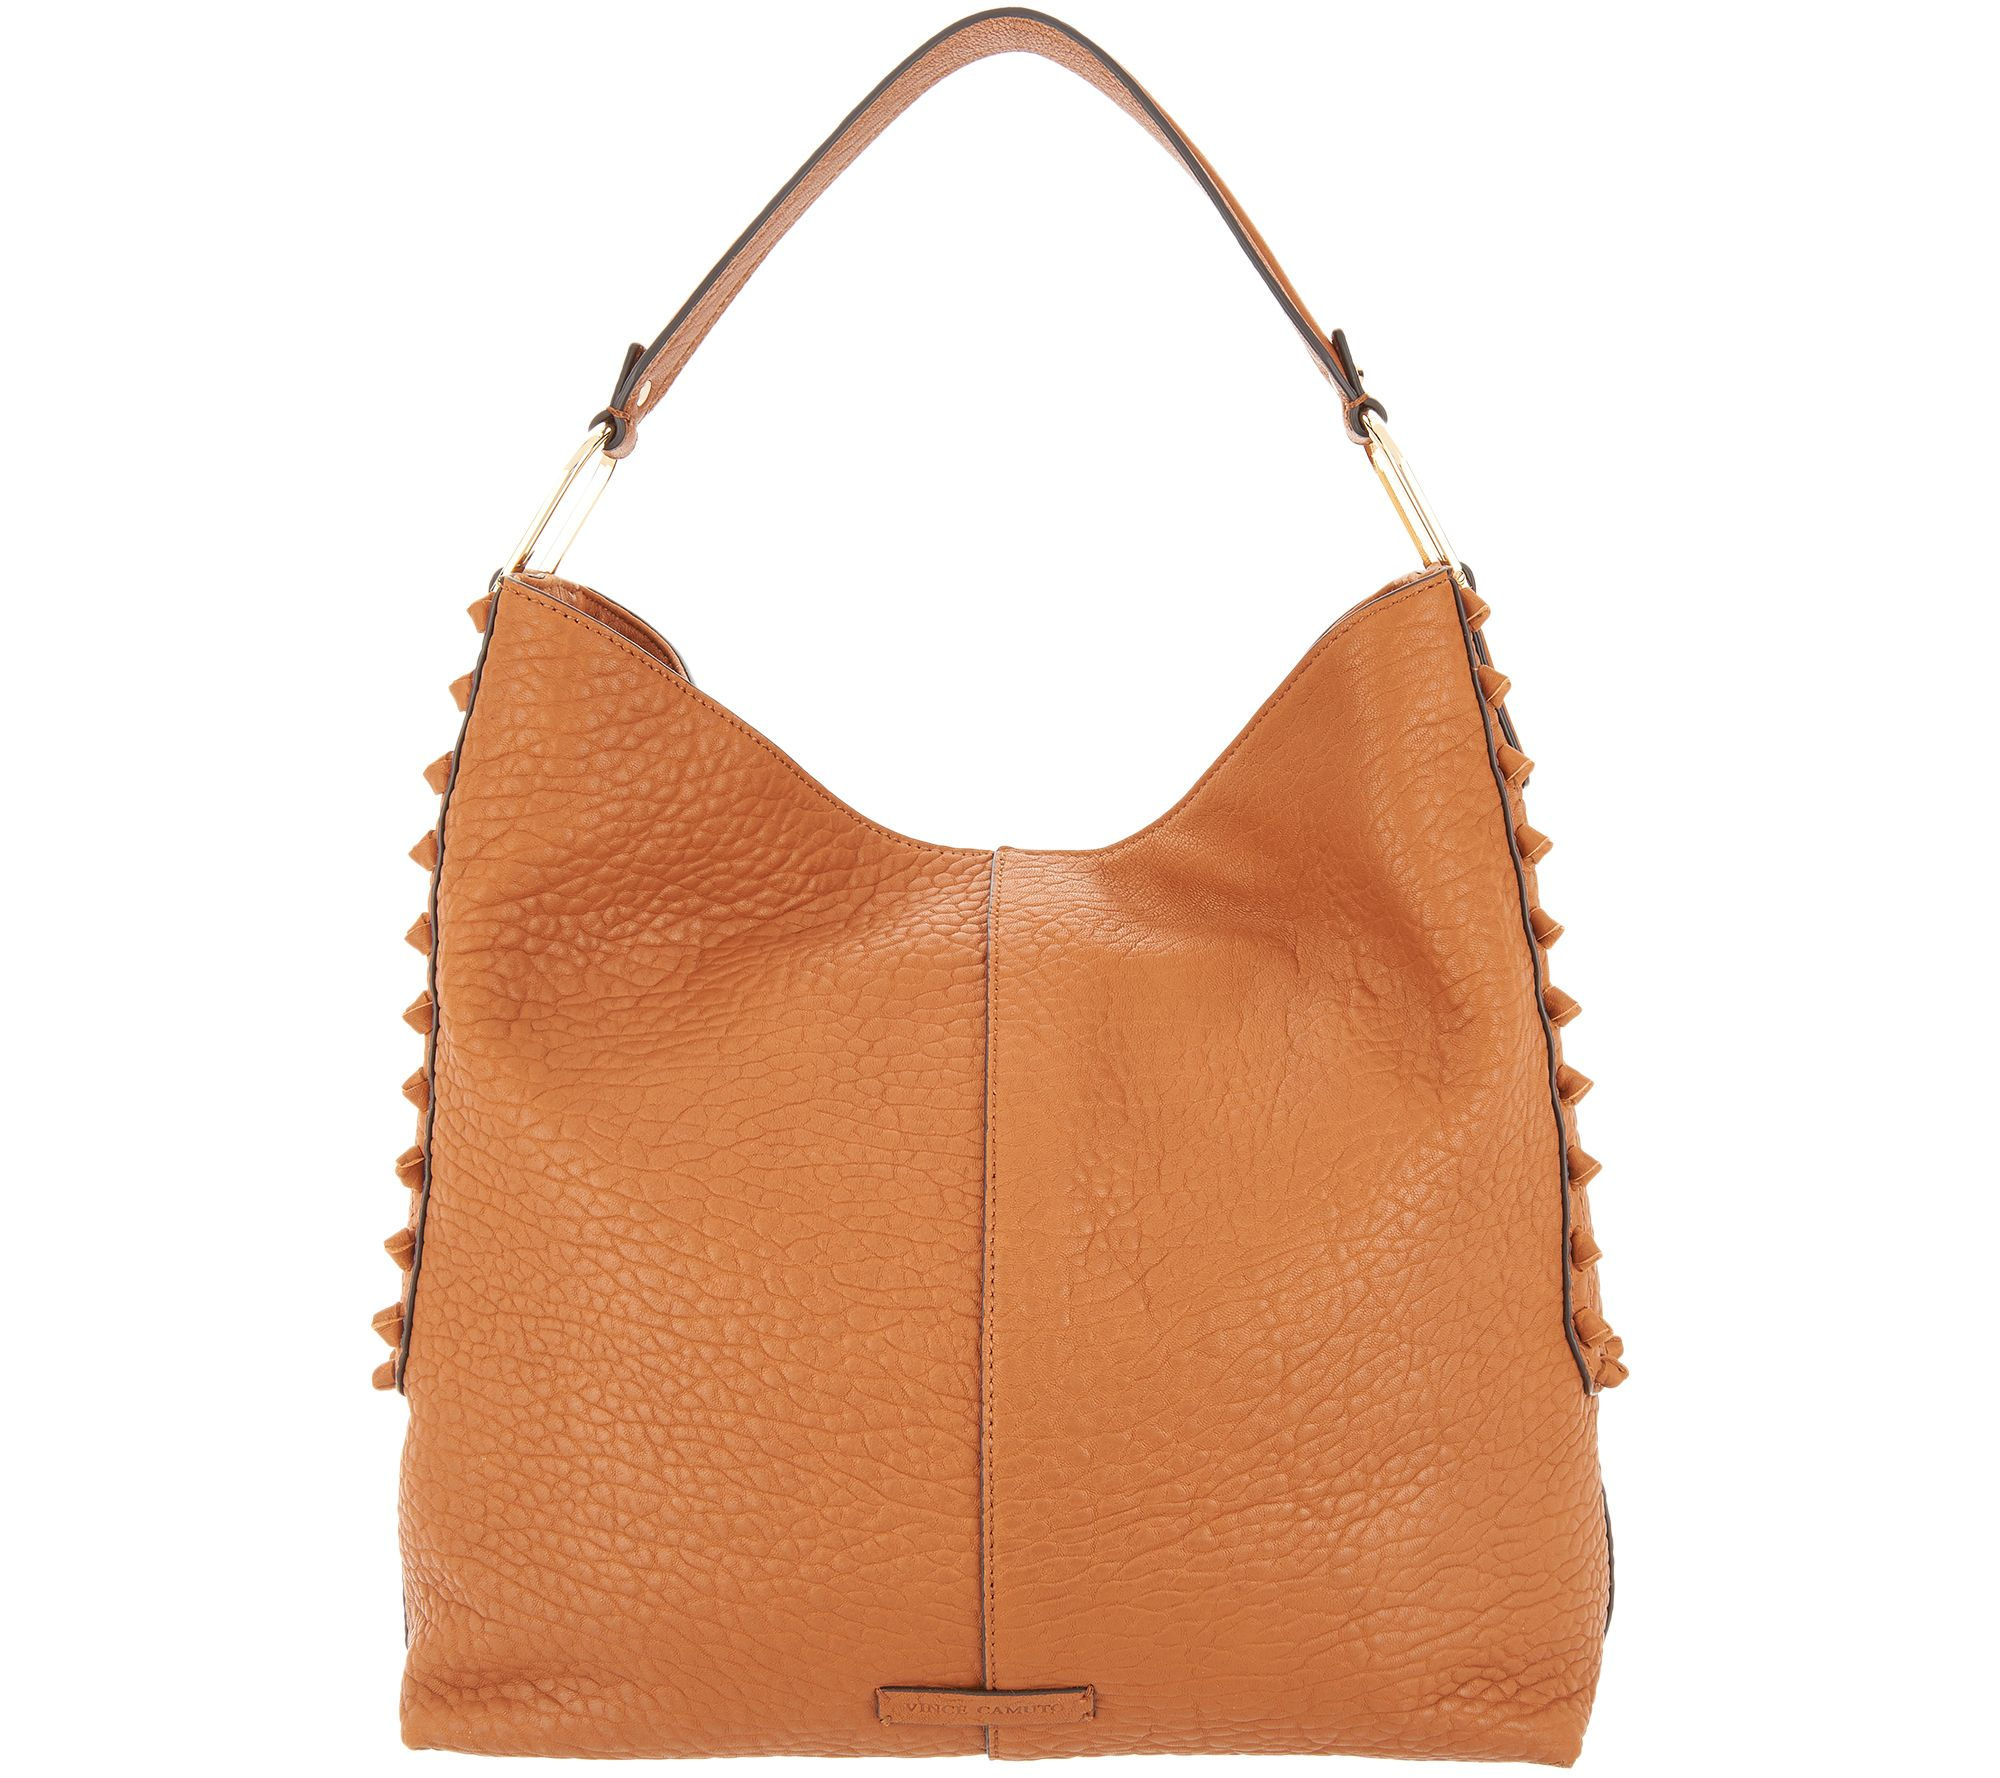 Vince Camuto Leather Hobo Handbag - Axmin - Page 1 — QVC.com f1e7ab8197